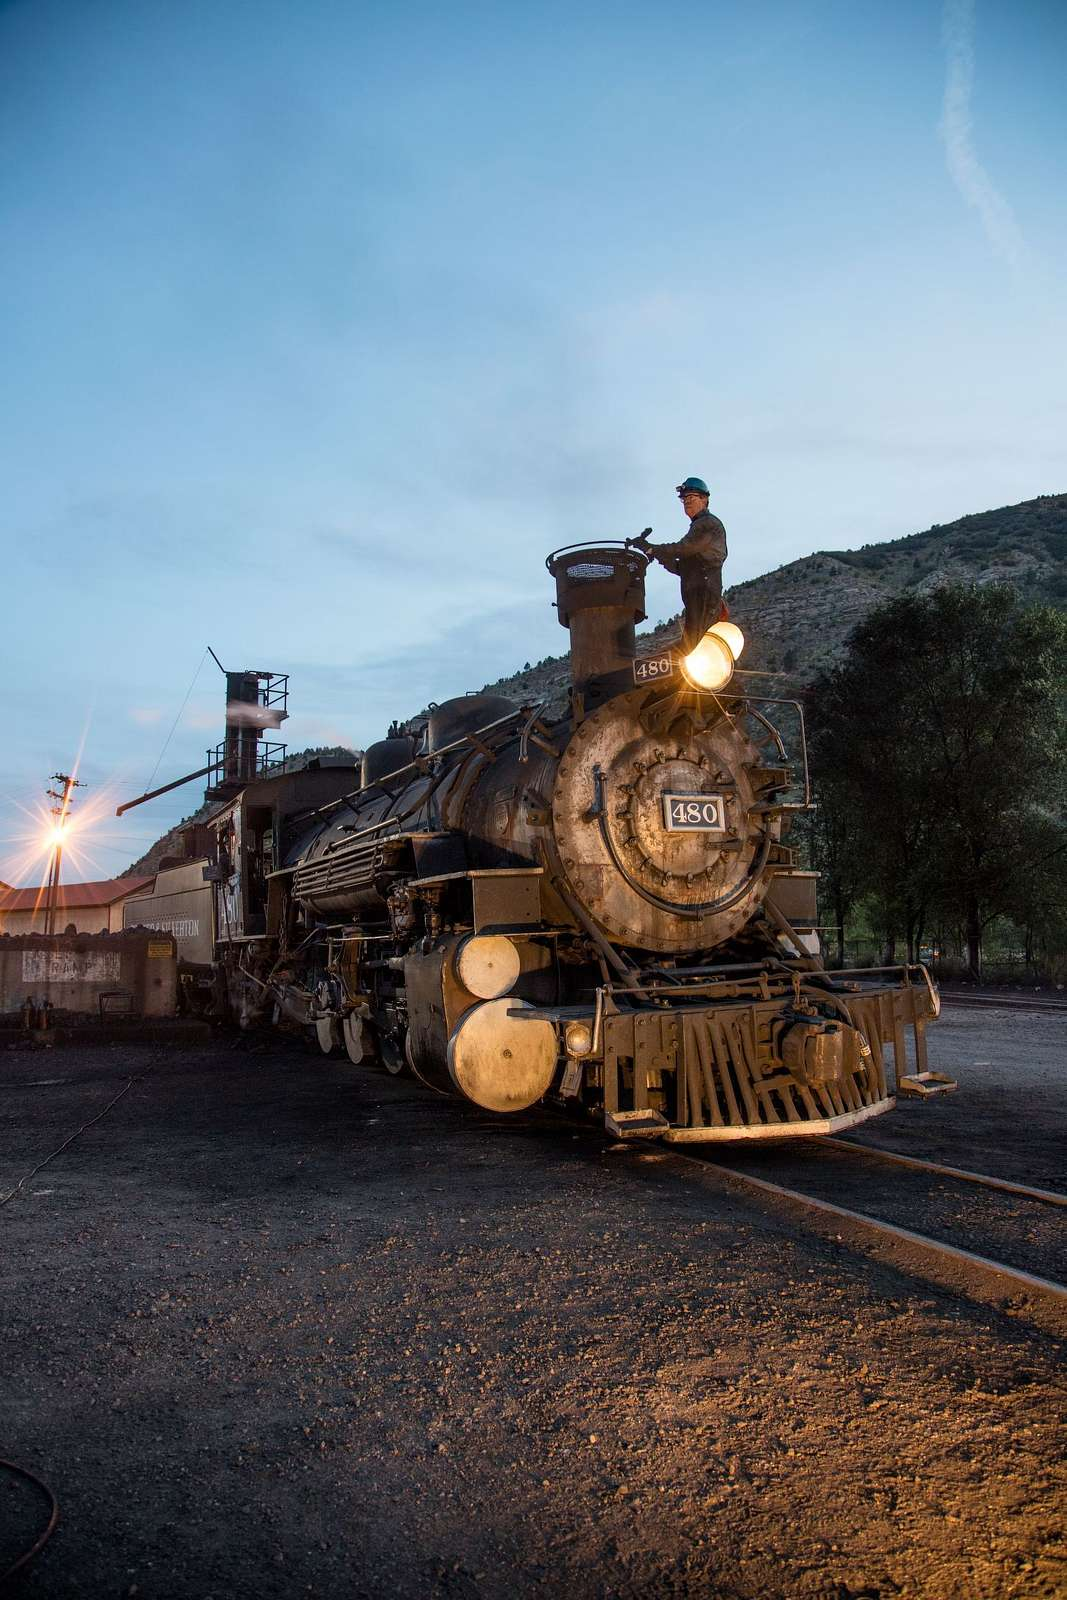 Steam locomotive in the trainyard of the Durango & Silverton Narrow Gauge Scenic Railroad in Durango, Colorado